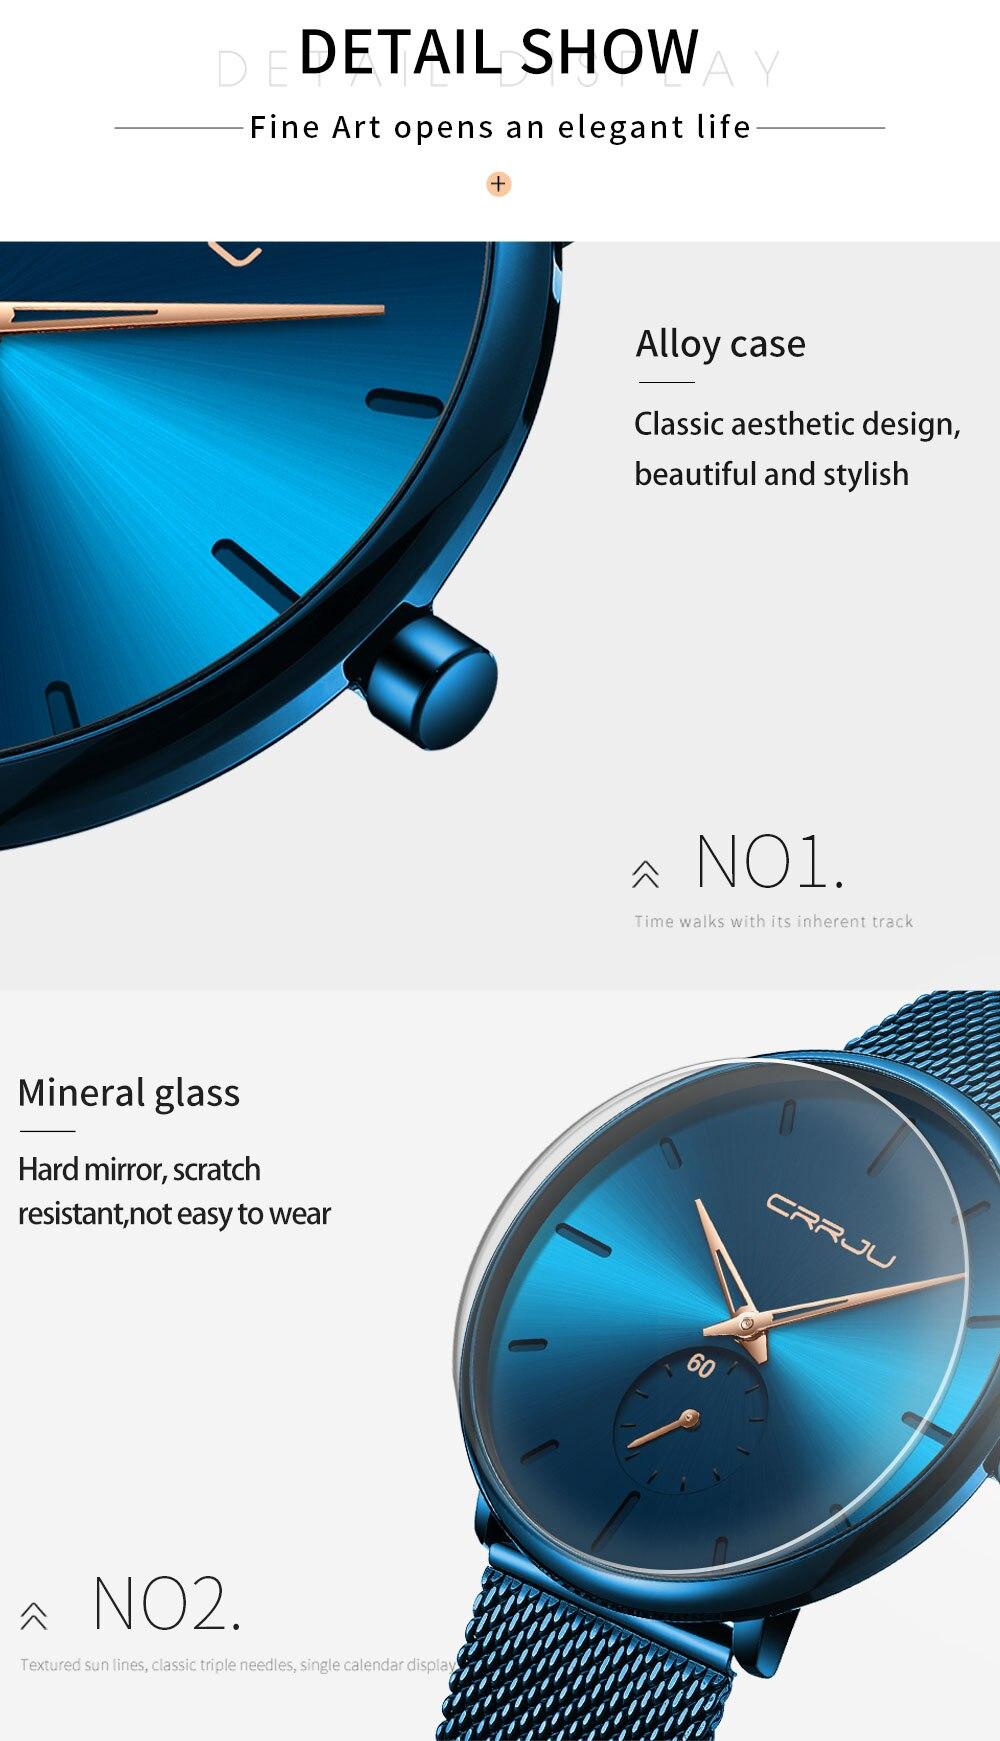 Hfe73293907f744baac8ed214e01416a3c CRRJU Ultra Thin Blue Stainless steel Quartz Watches Men Simple Fashion Business Japan Wristwatch Clock Male Relogio Masculino